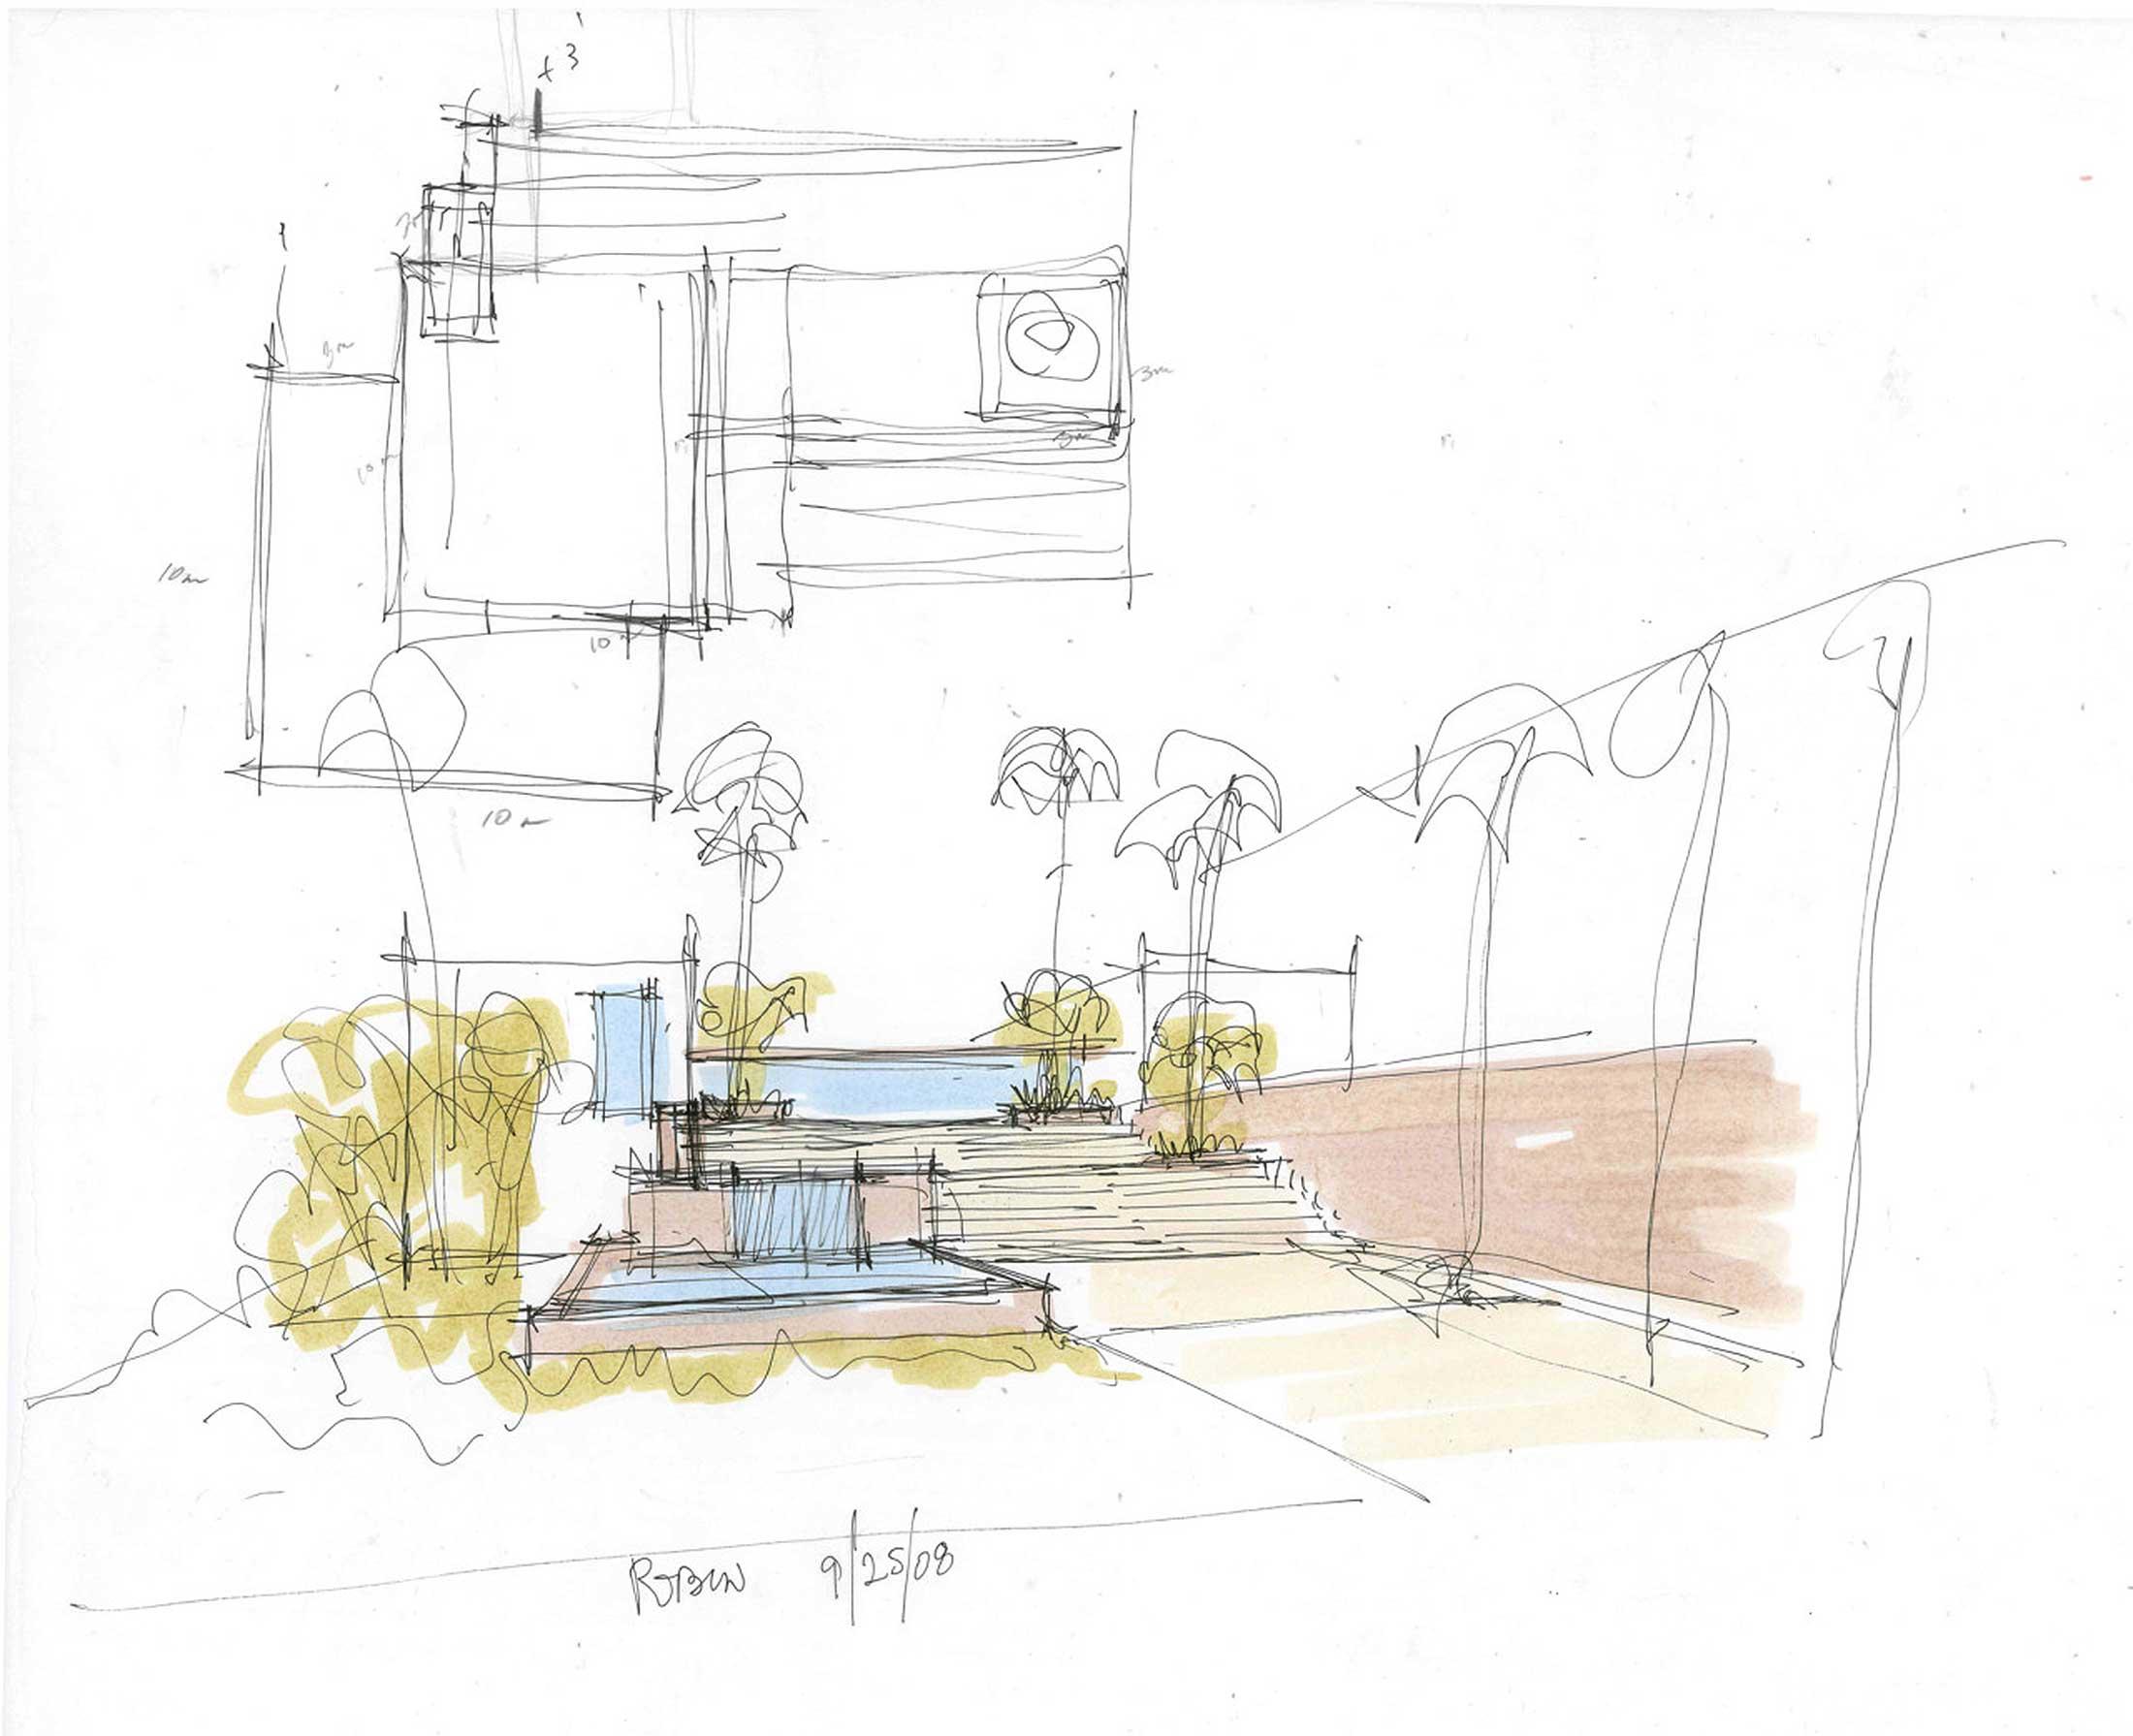 modern-architecture-residential-estate-uae-plan-sketch-shubindonaldson-dubai-villas-1